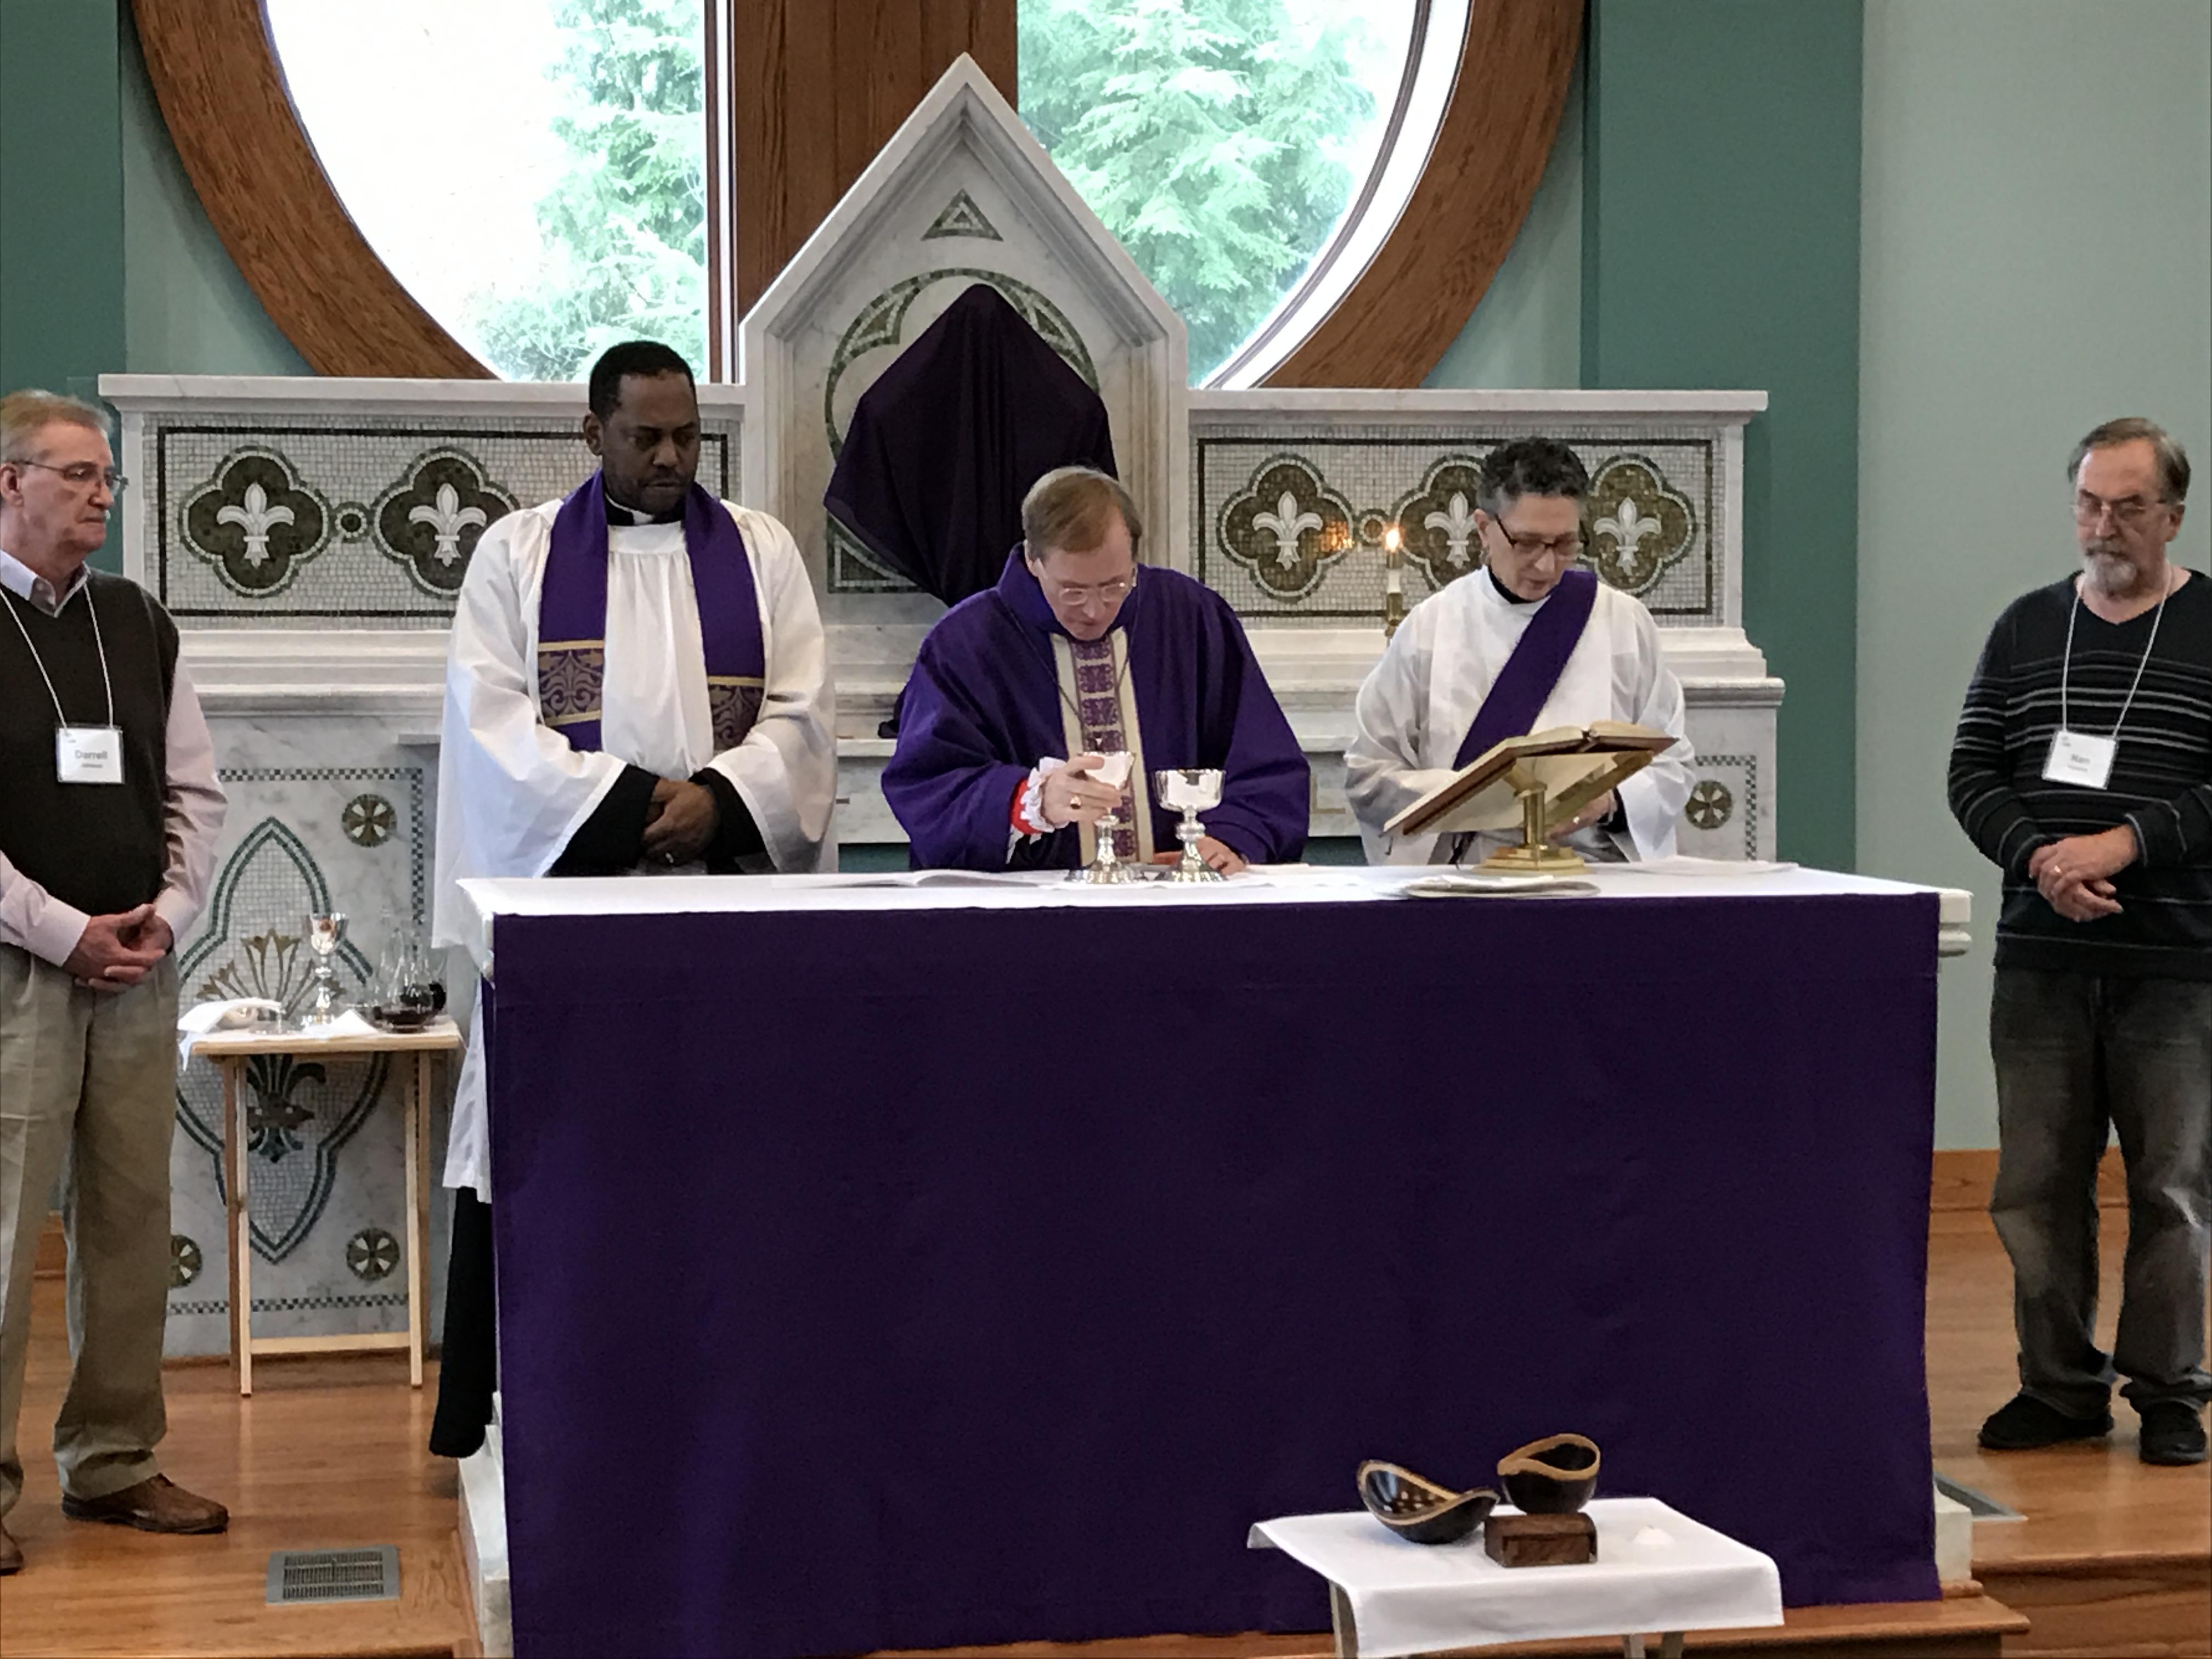 Evangelism Conf 2017 - group at alter